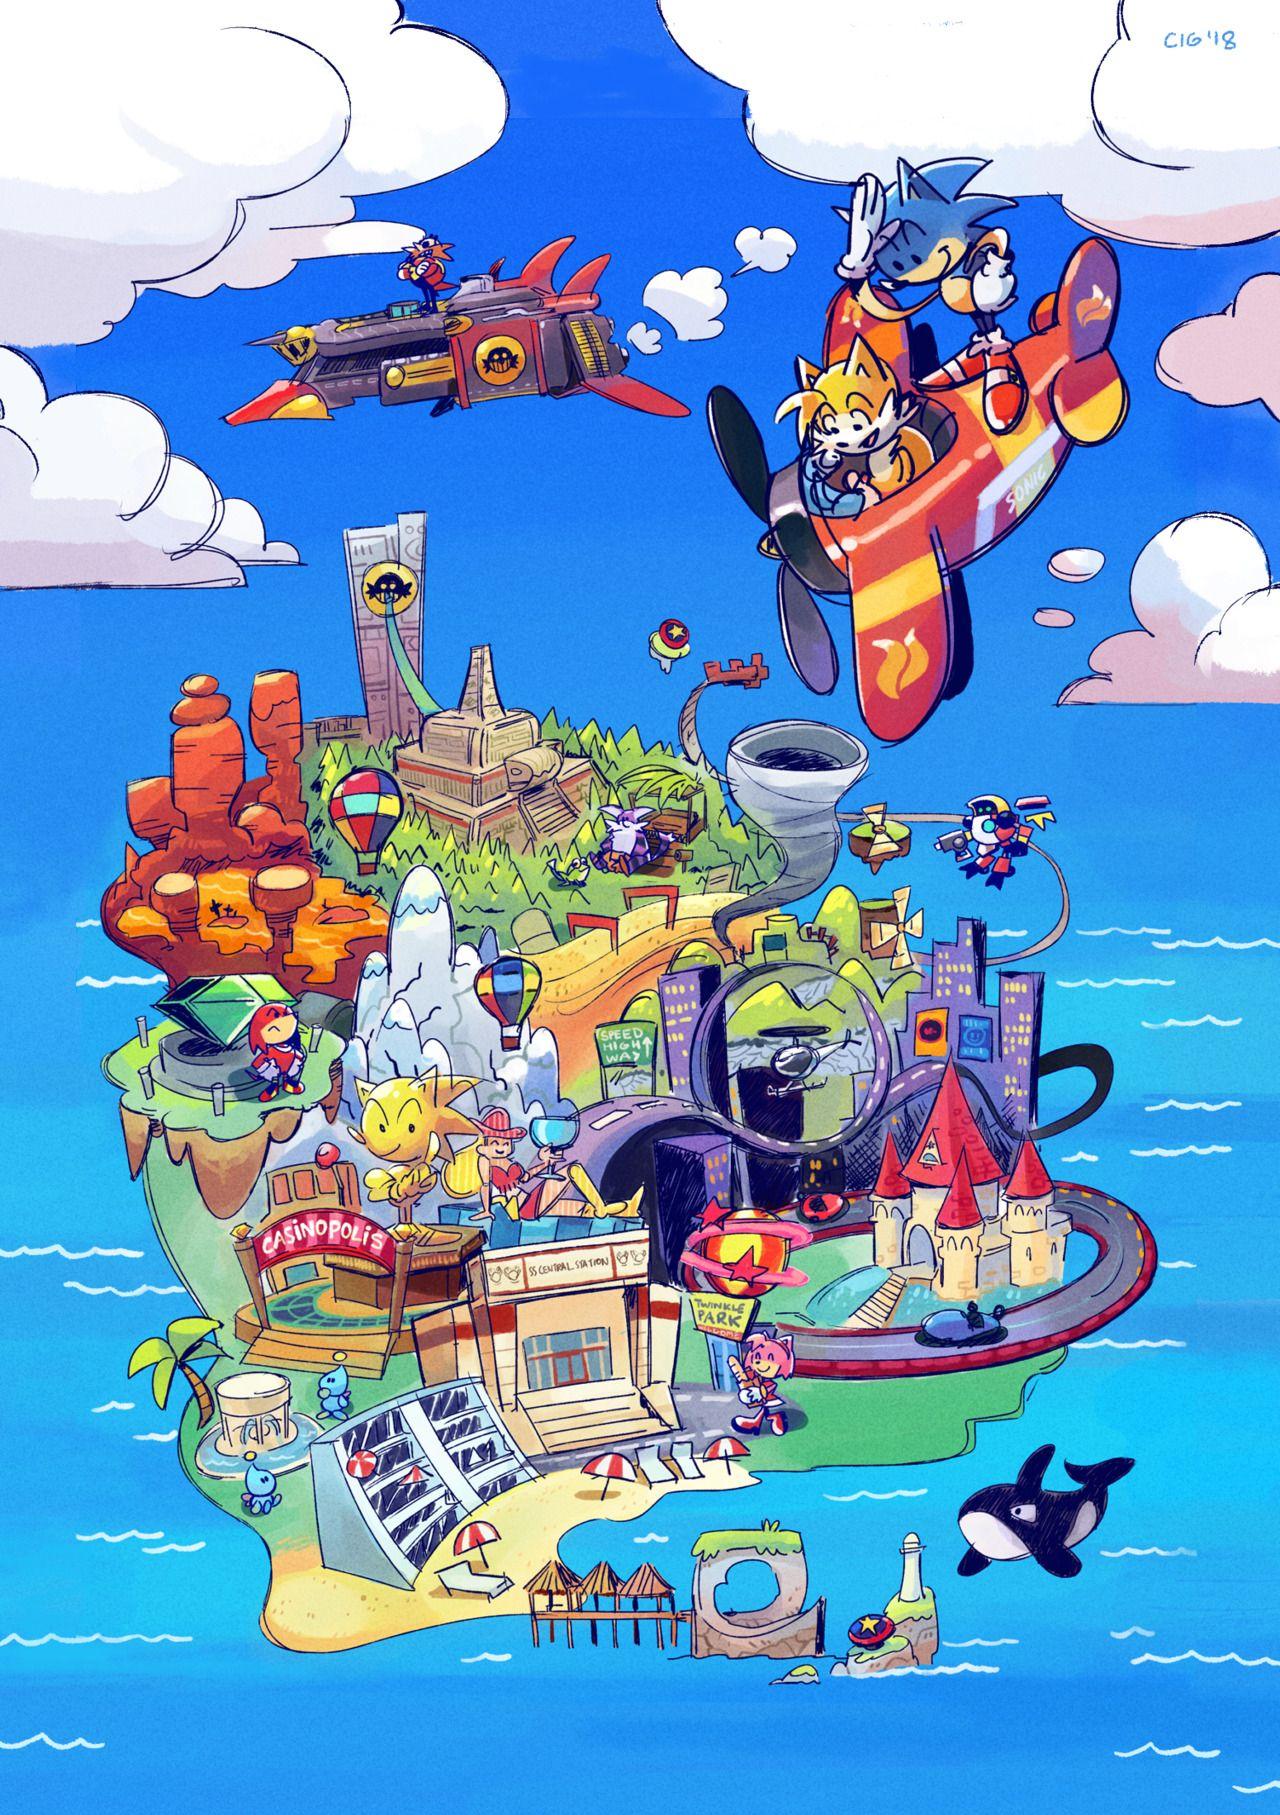 a Sonic Adventure world map! | Games I Love | Pinterest | Sonic